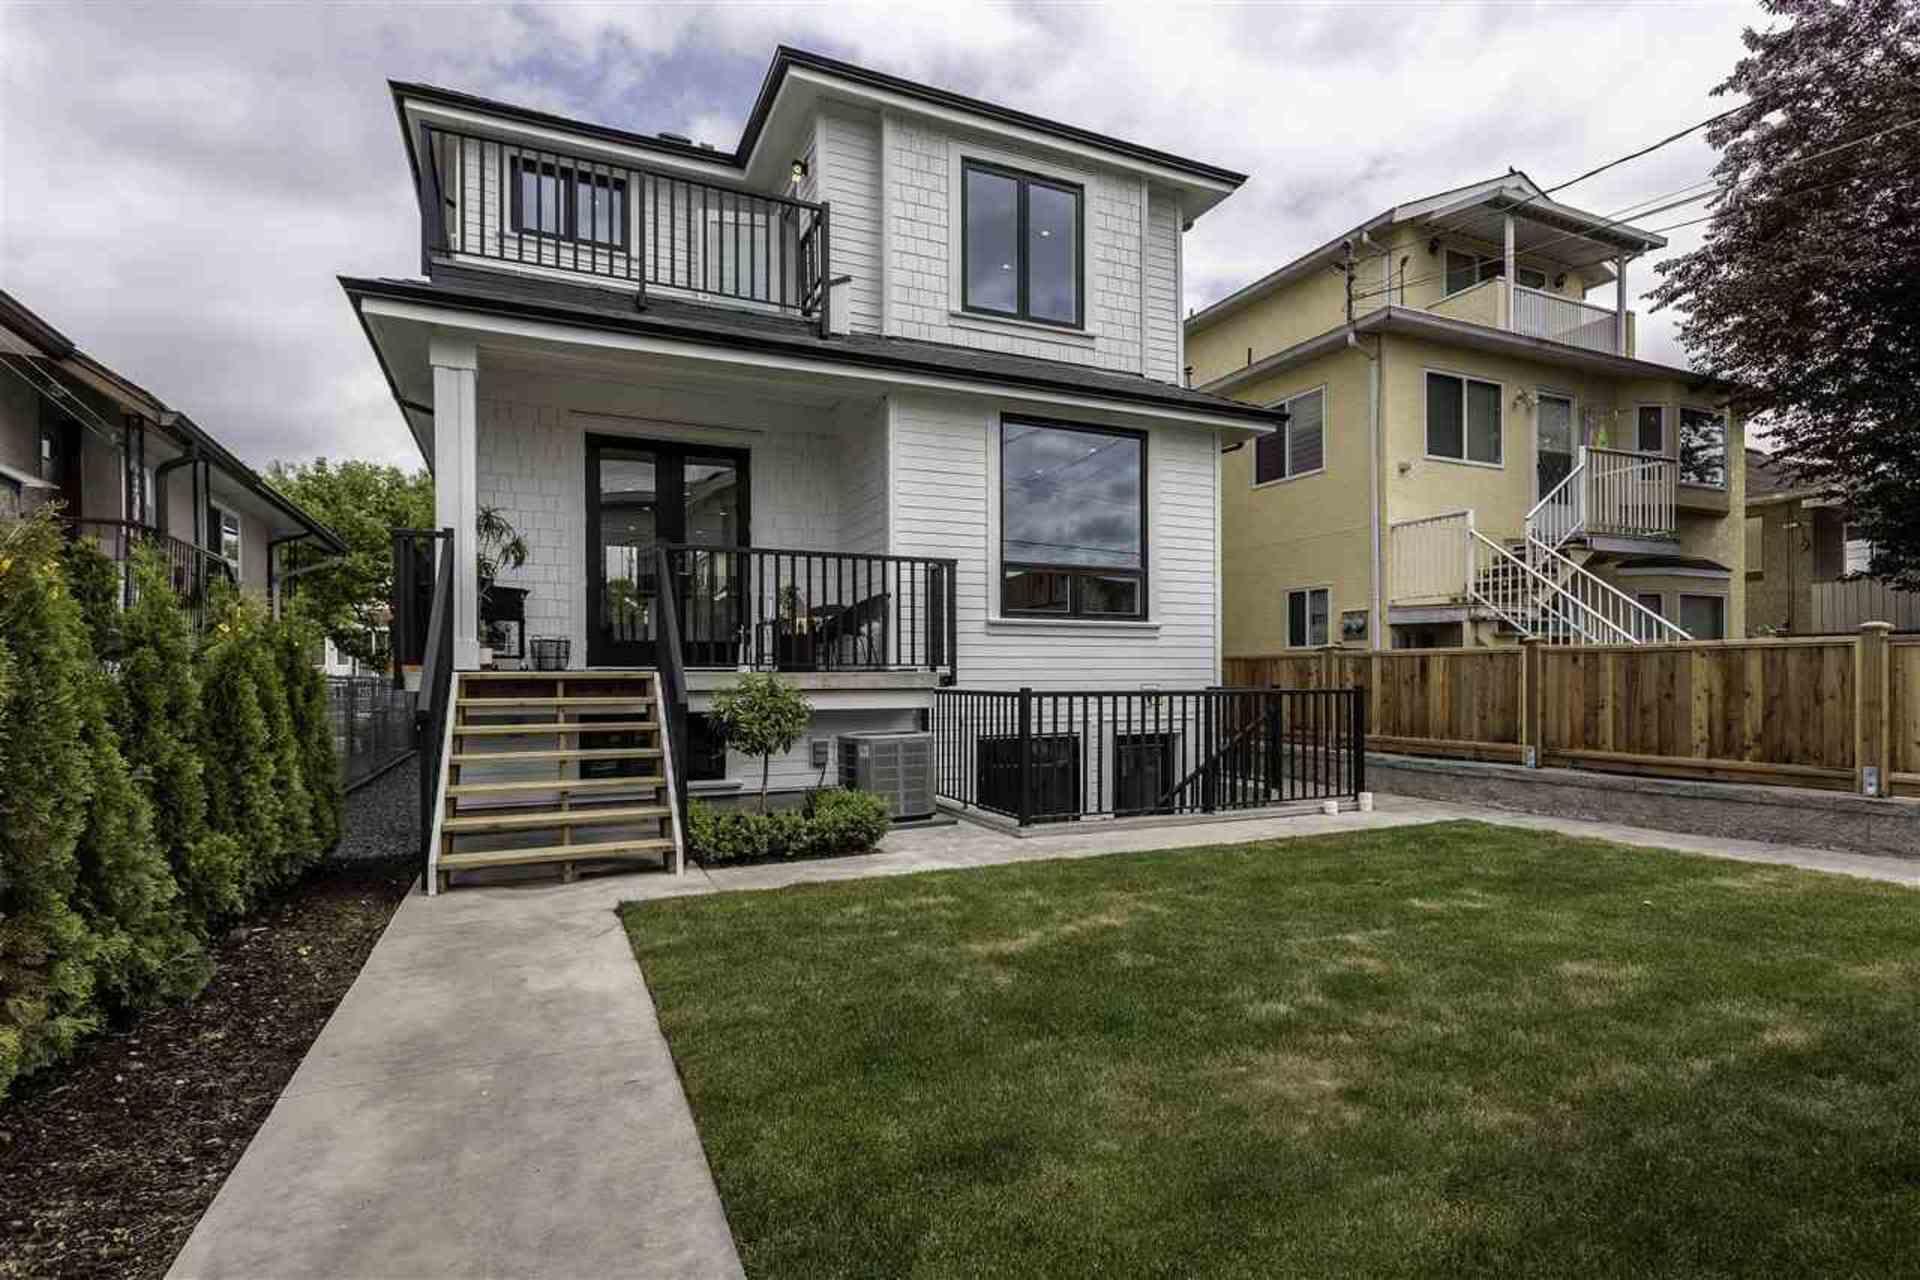 1221-rossland-street-renfrew-ve-vancouver-east-19 at 1221 Rossland Street, Renfrew VE, Vancouver East